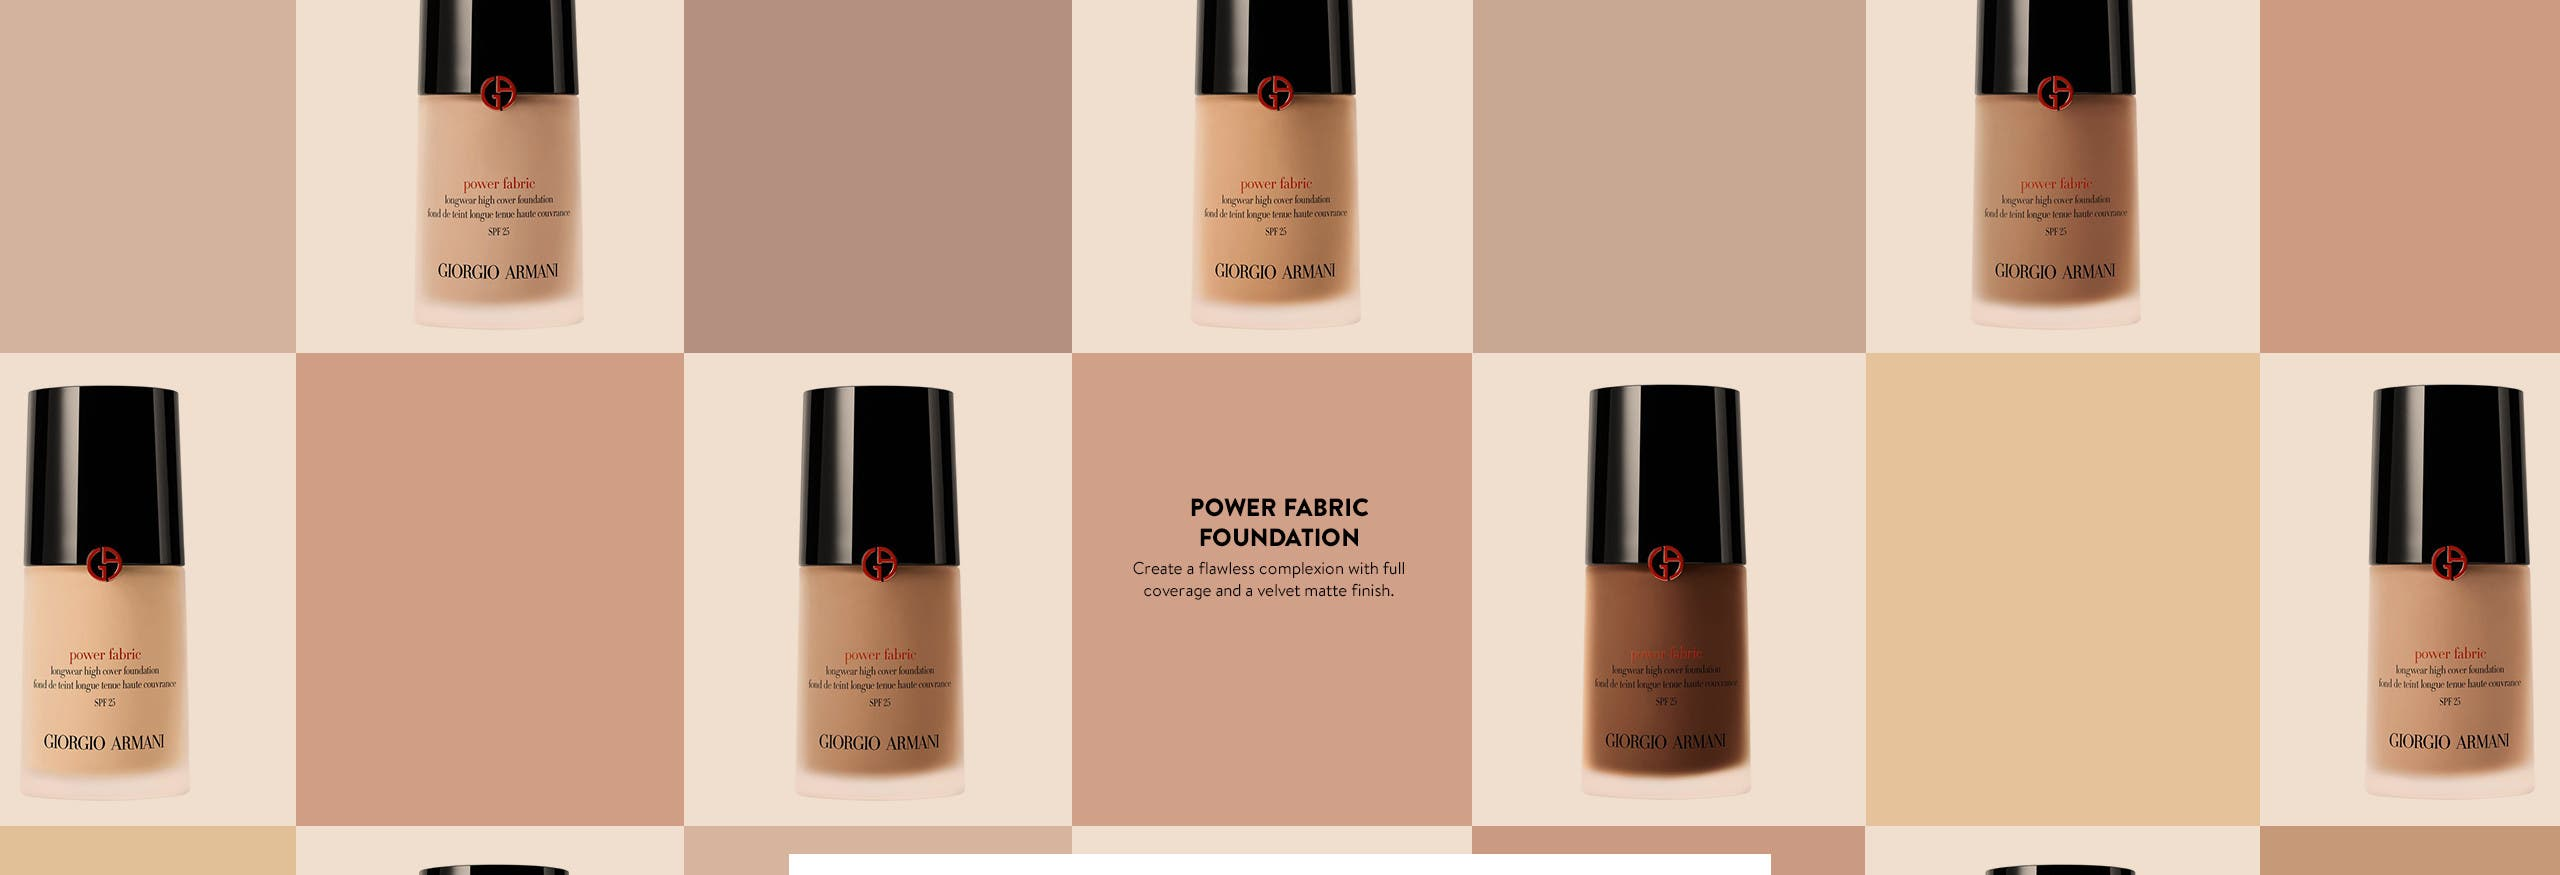 Power Fabric Foundation.